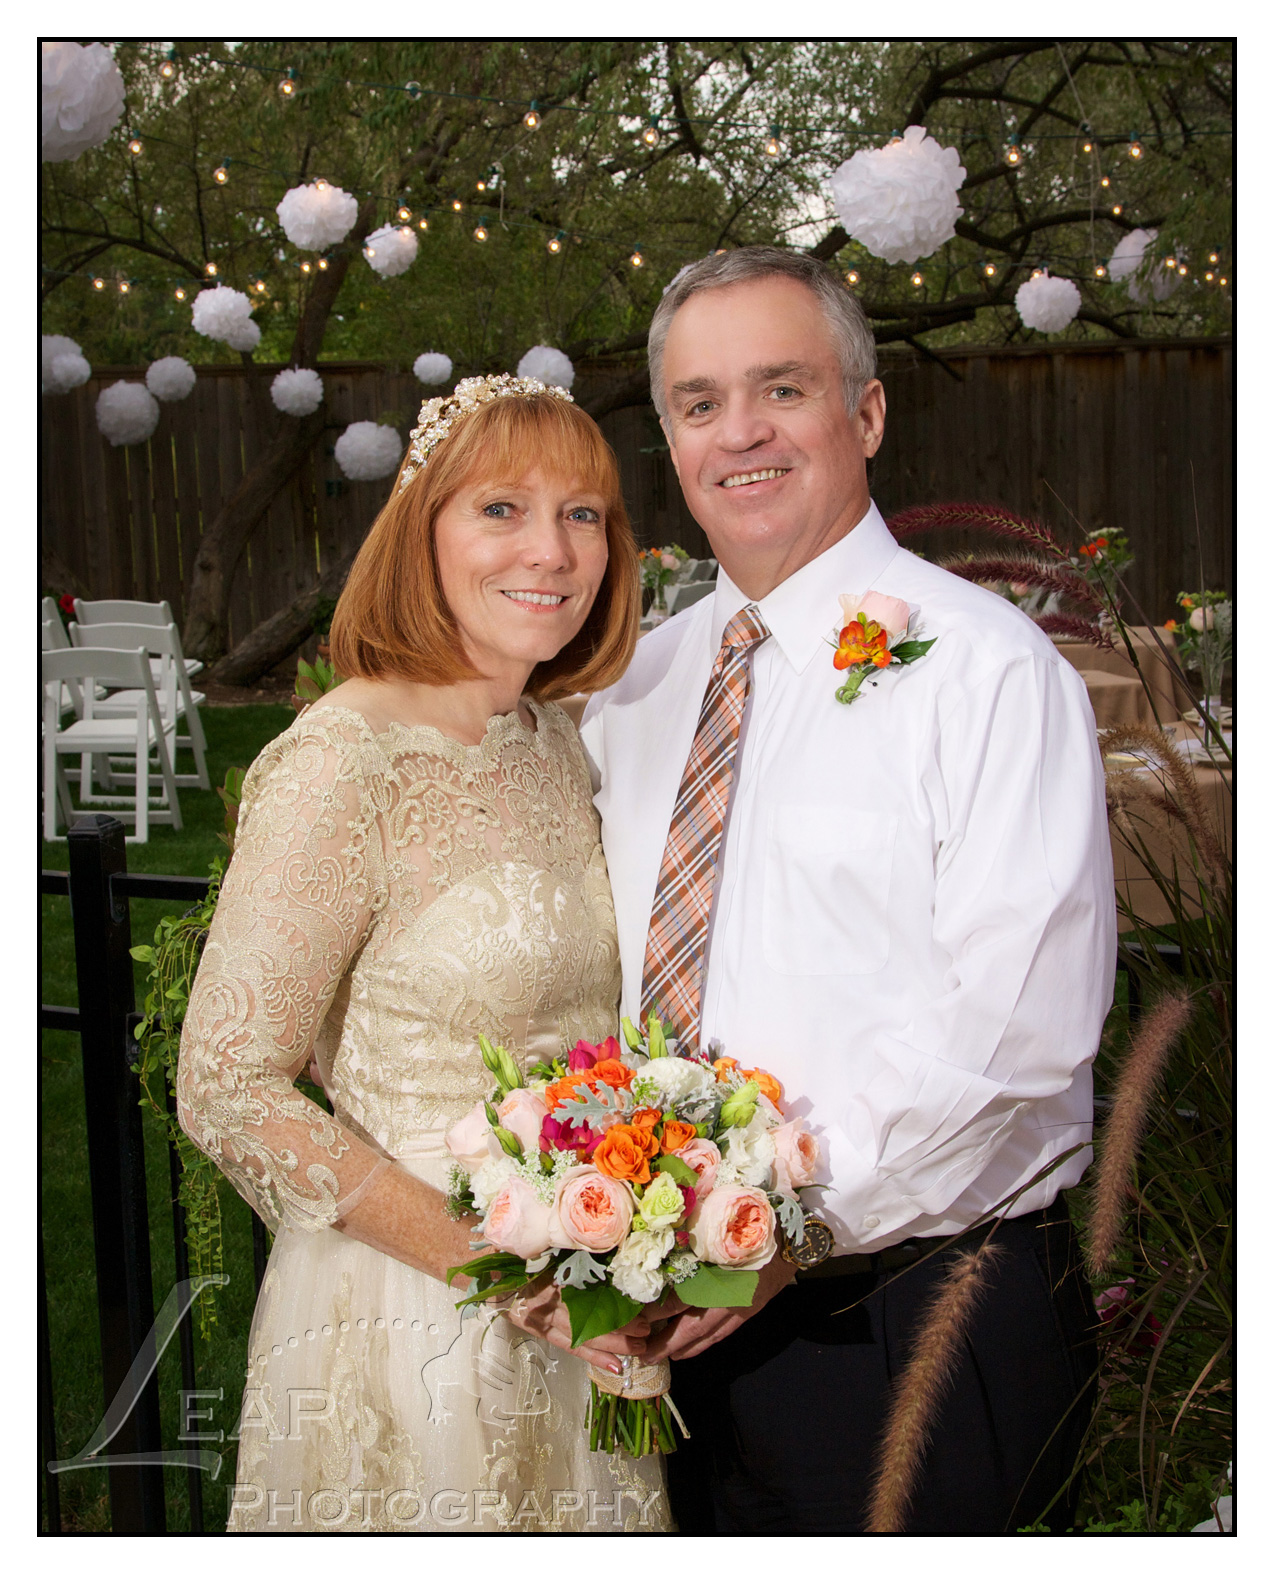 Bride & Groom on their wedding day